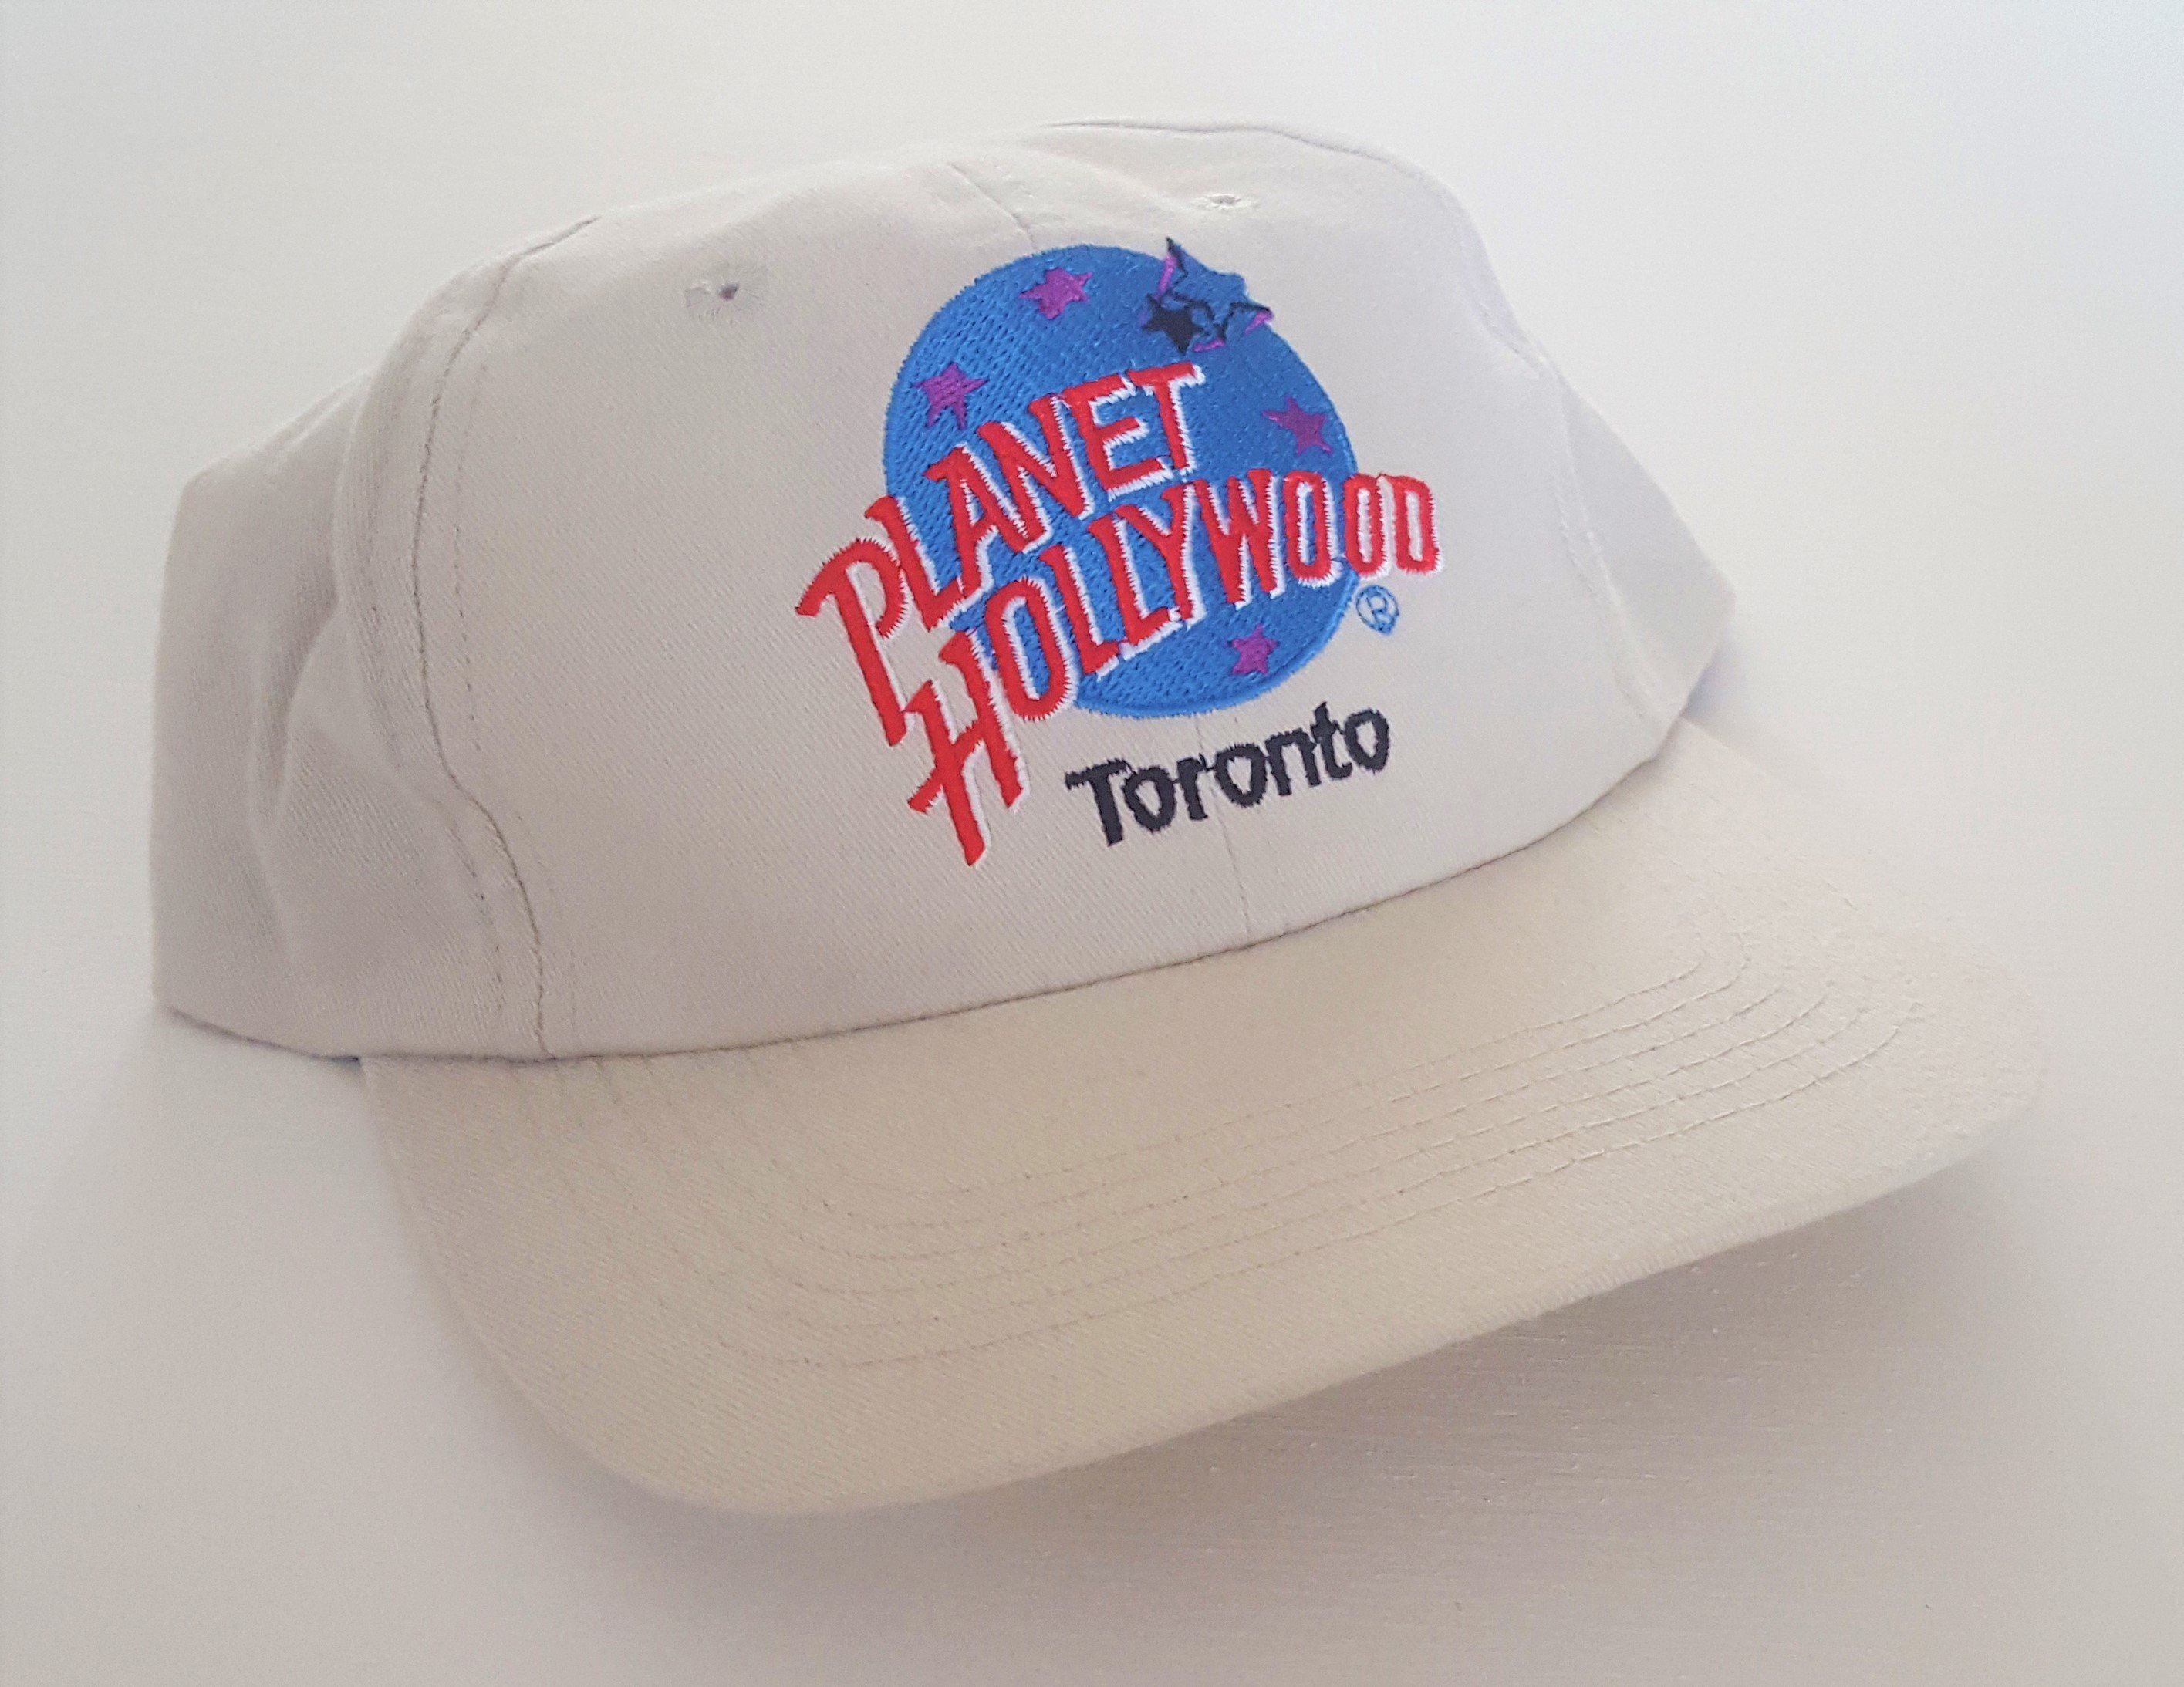 540b86b4ed75ee Vintage Toronto Planet Hollywood 90's Snapback Hat VTG by  StreetwearAndVintage on Etsy